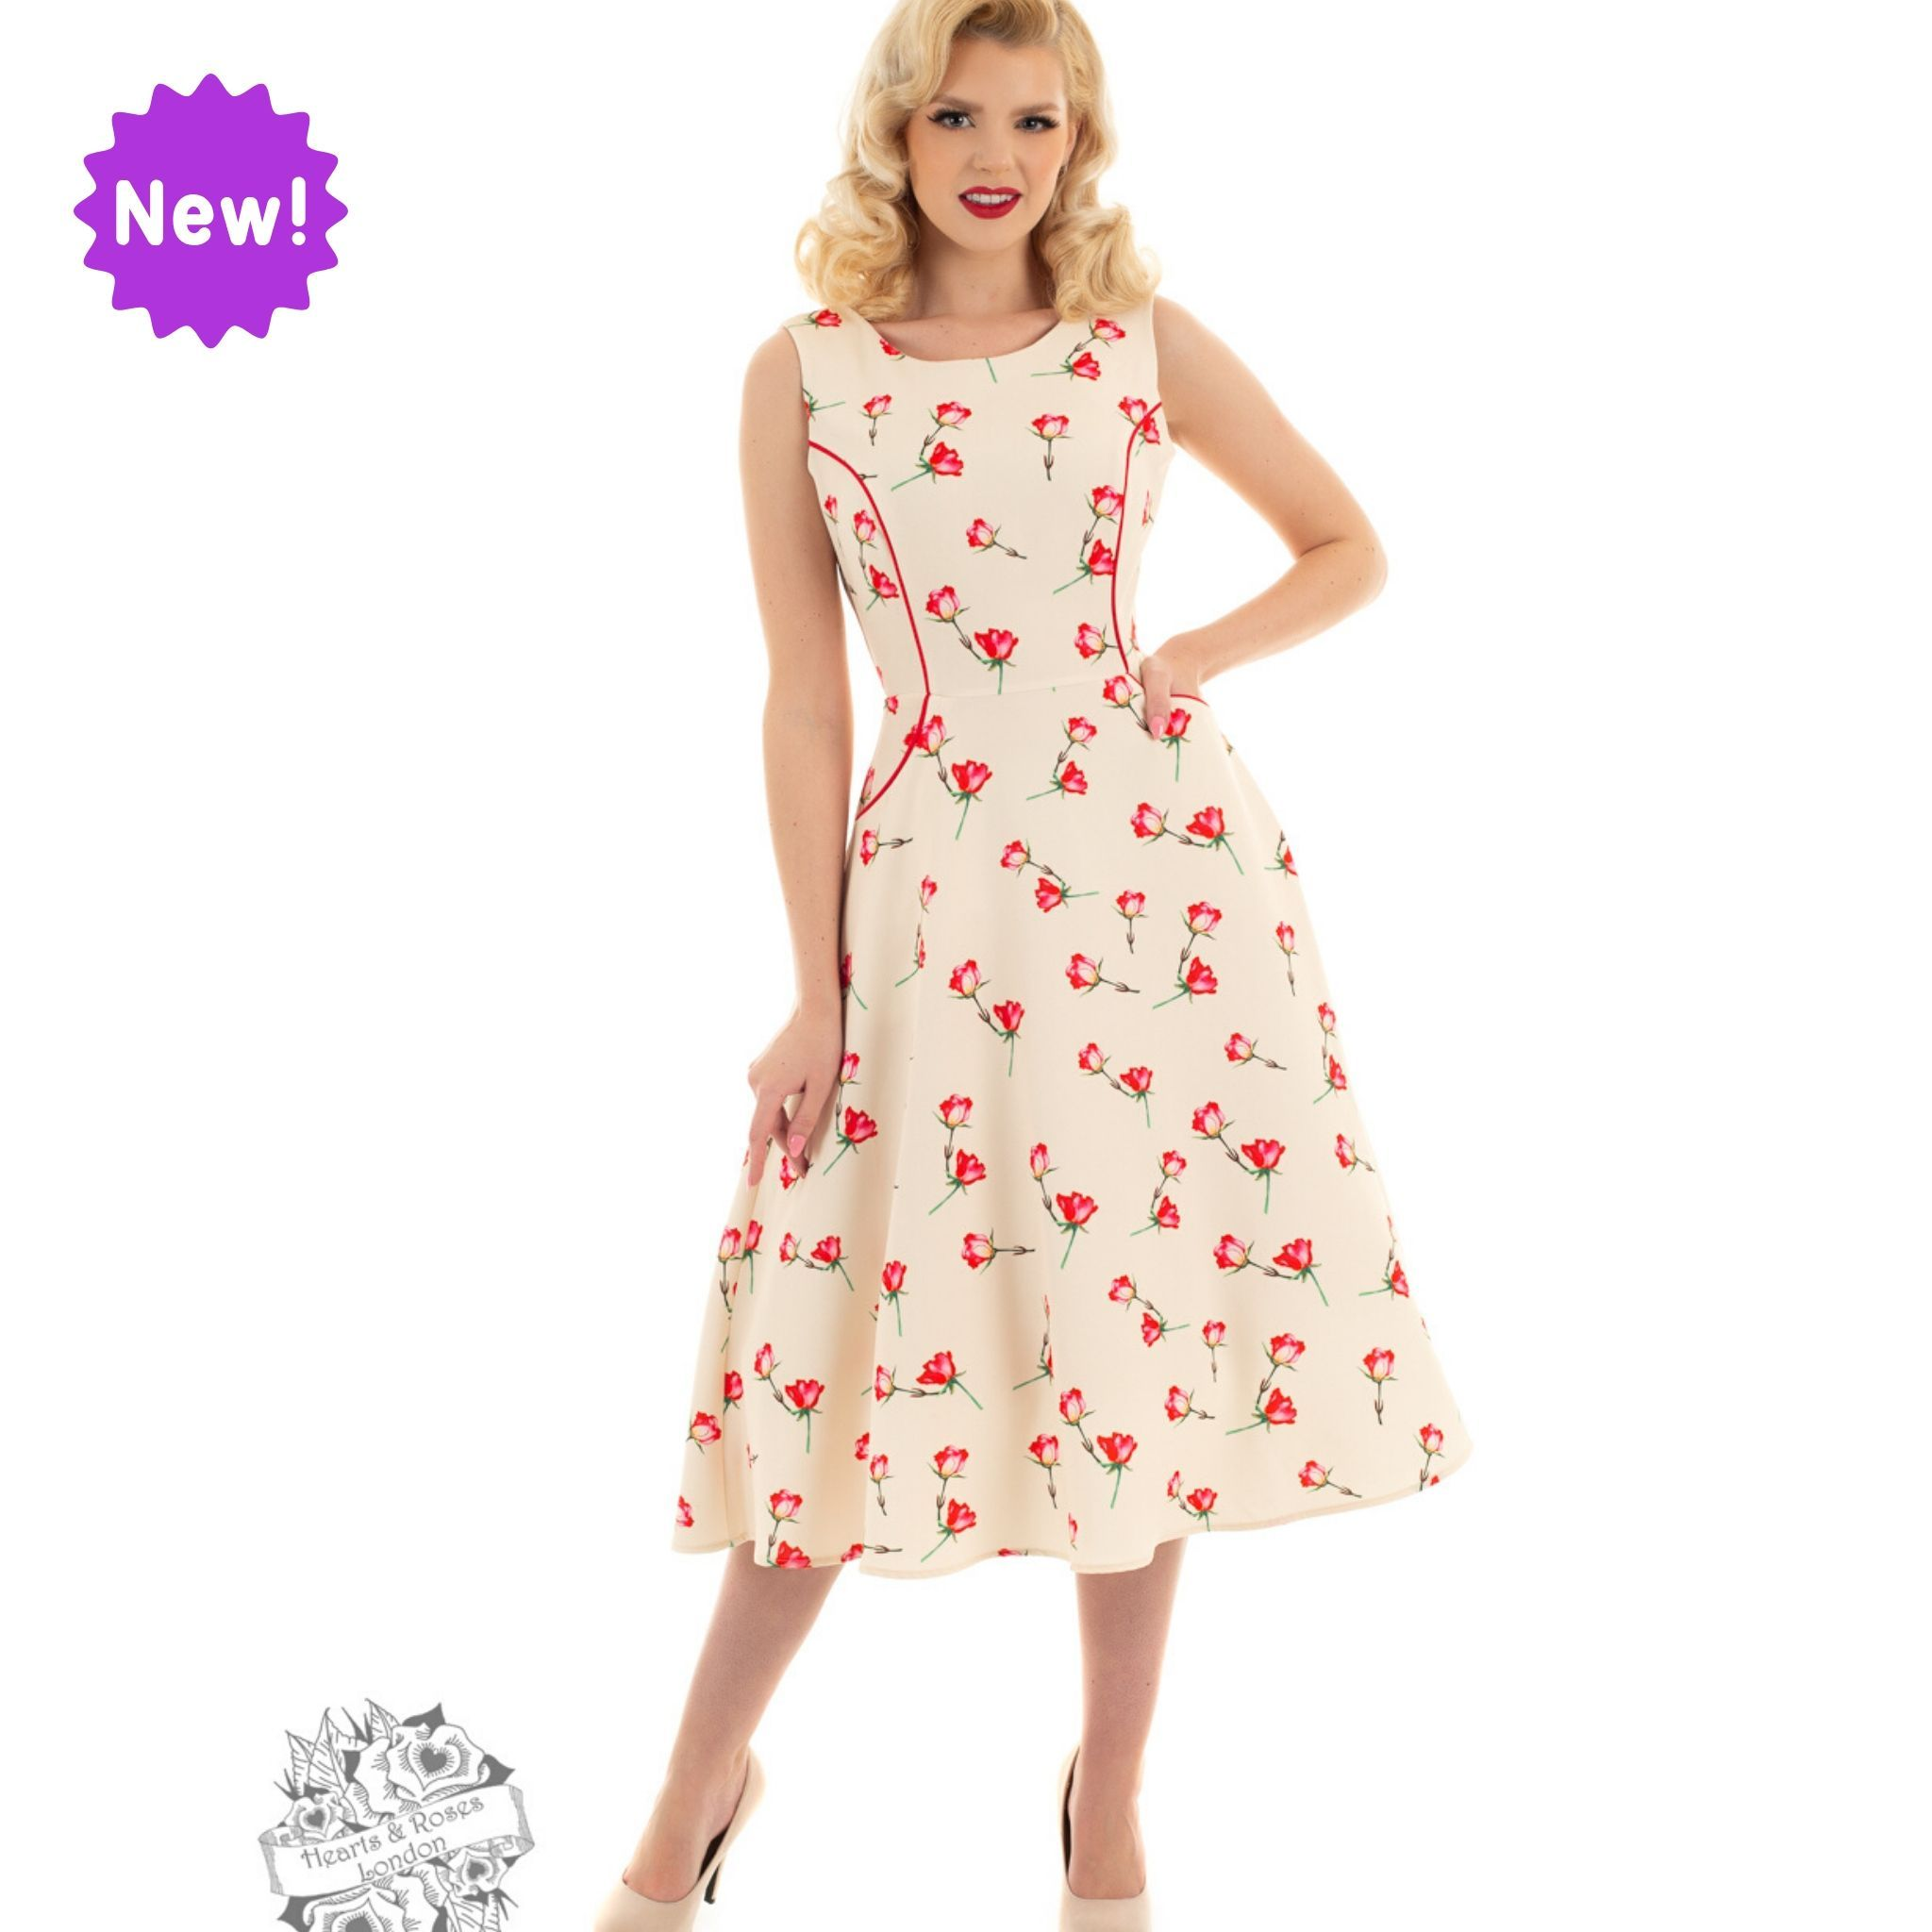 Robe swing Sorella, style vintage, beige imprimé de petites roses